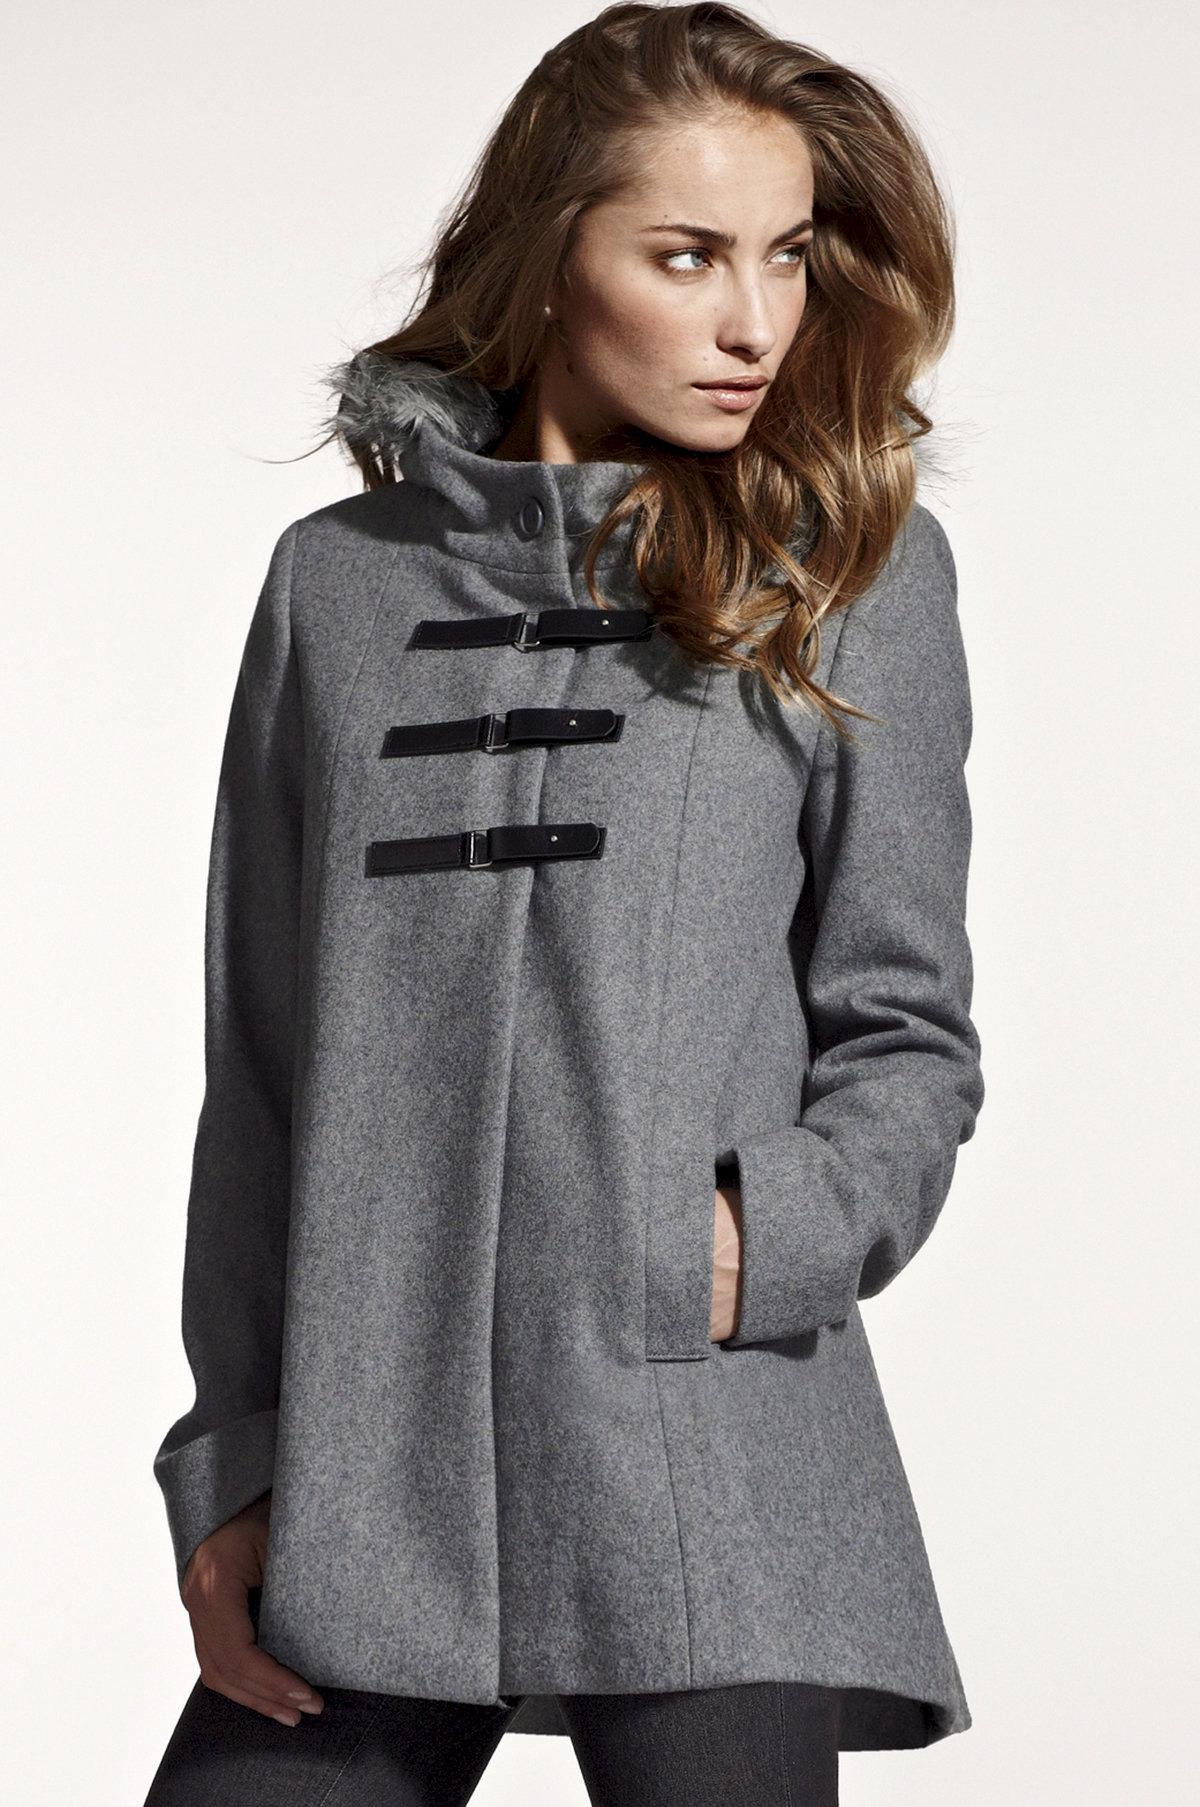 2018 Fashion Internships m Fashionable winter coats for women